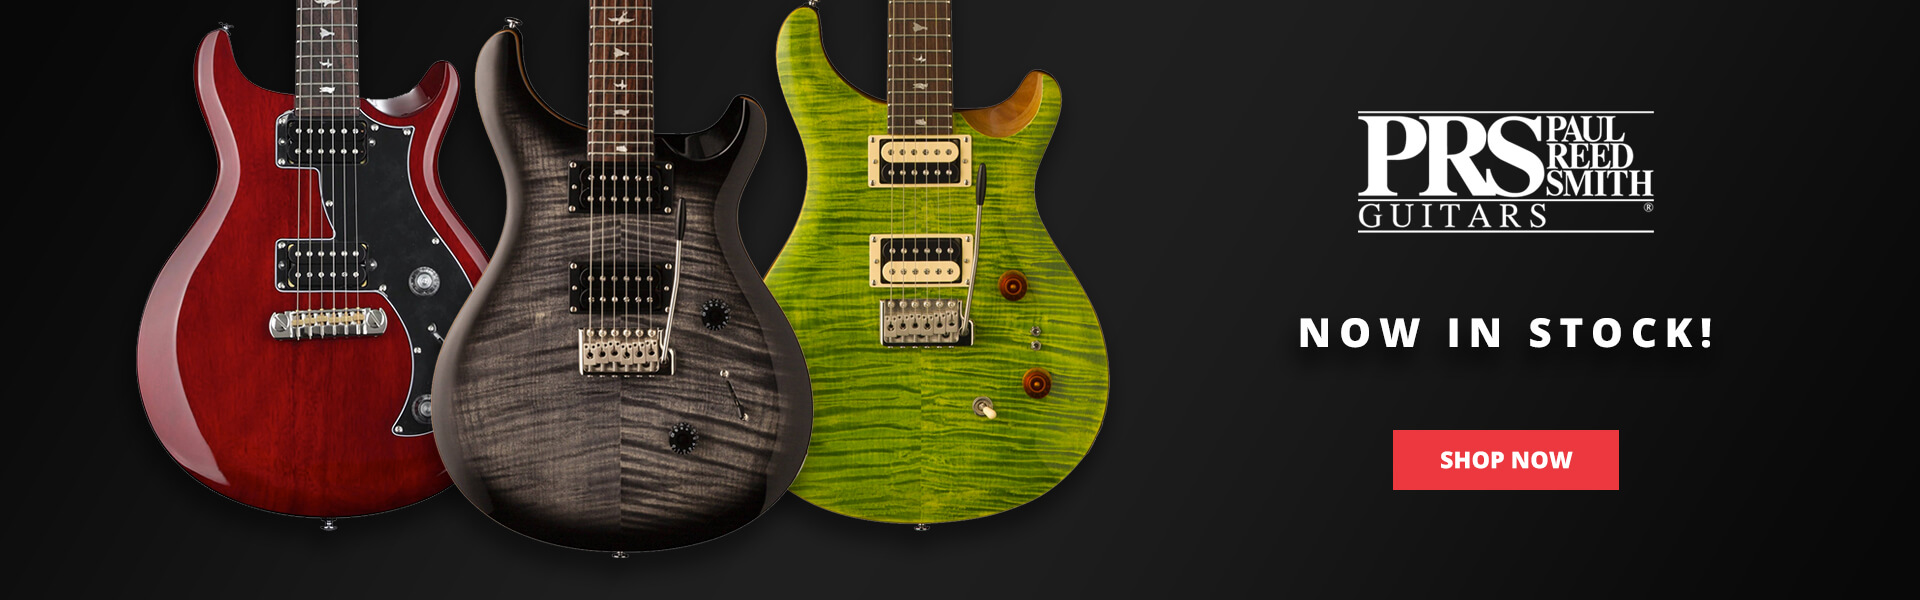 PRS Guitars - now available at Zebra Muzik!